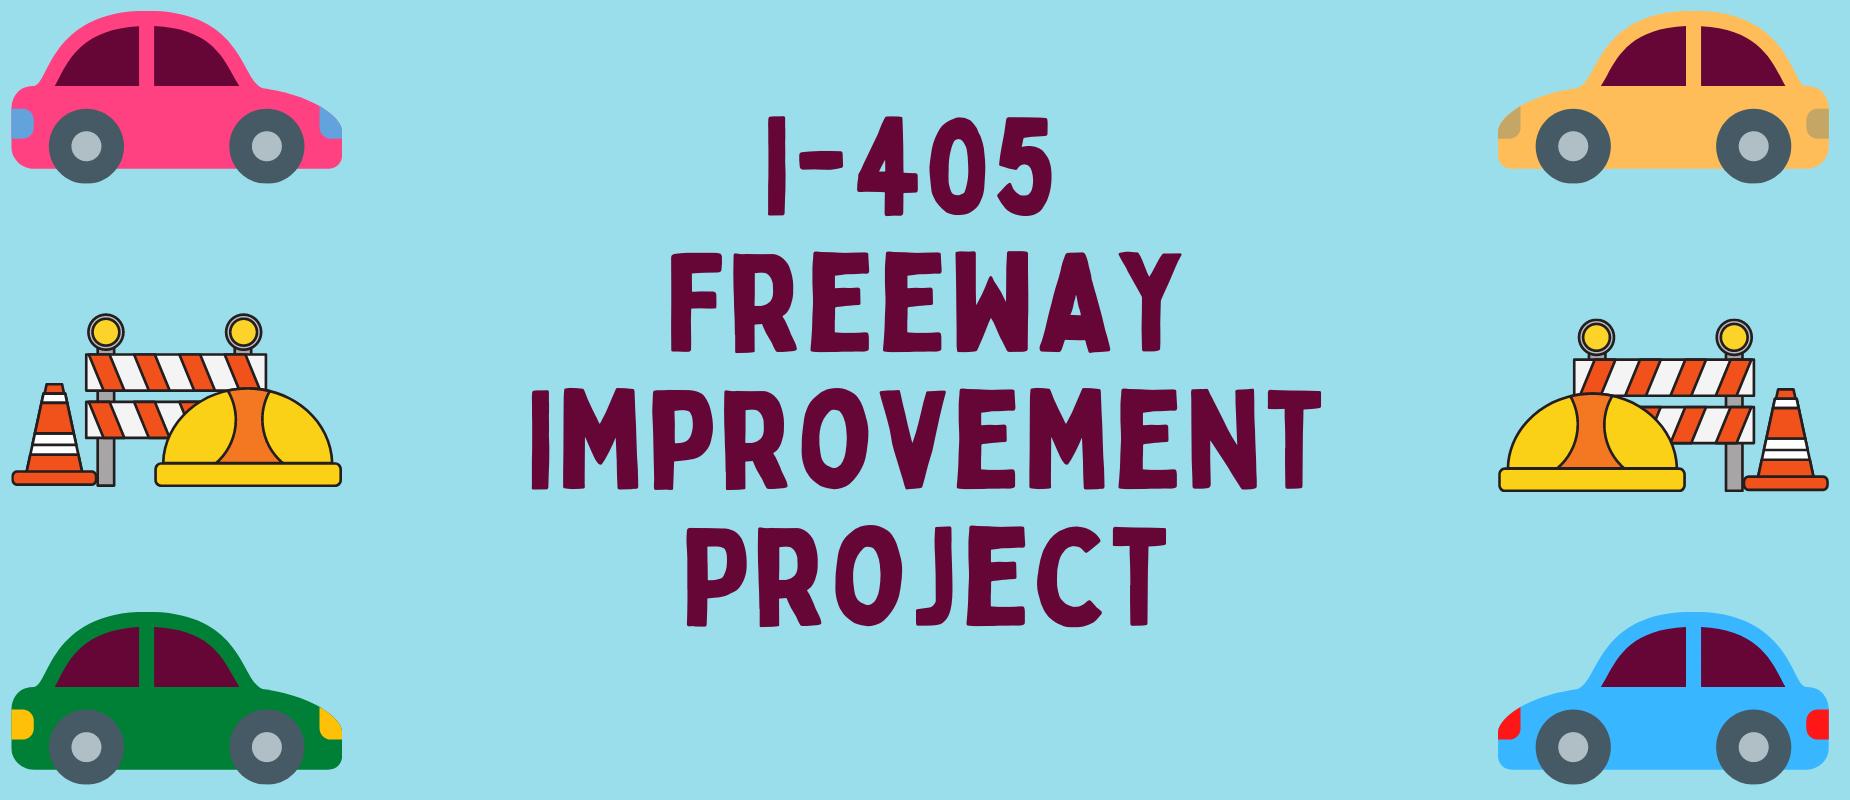 405 Freeway Construction Update